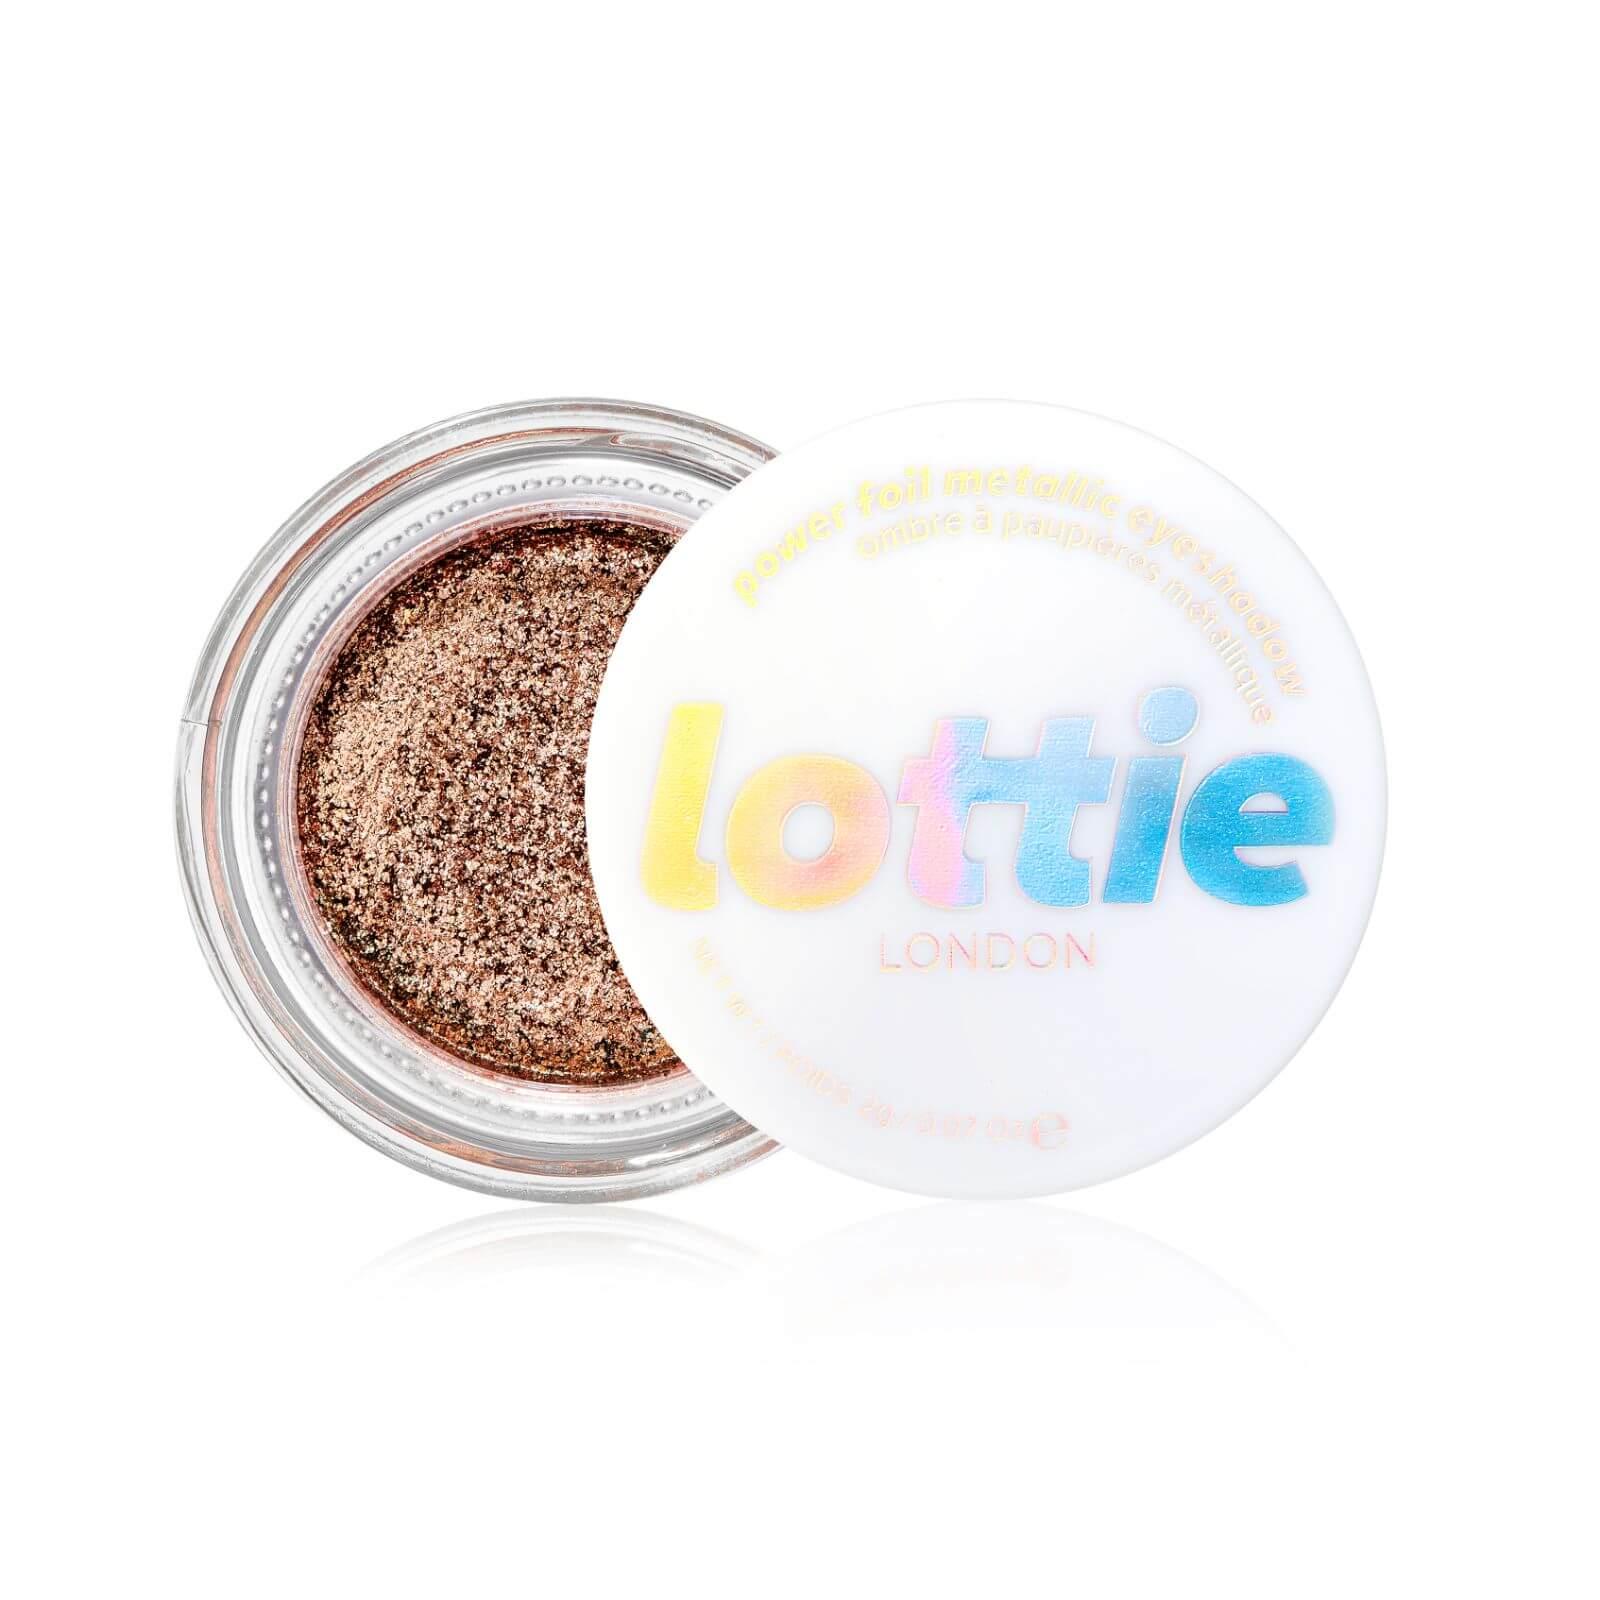 Купить Lottie London Power Foil 4g (Various Shades) - Unphased